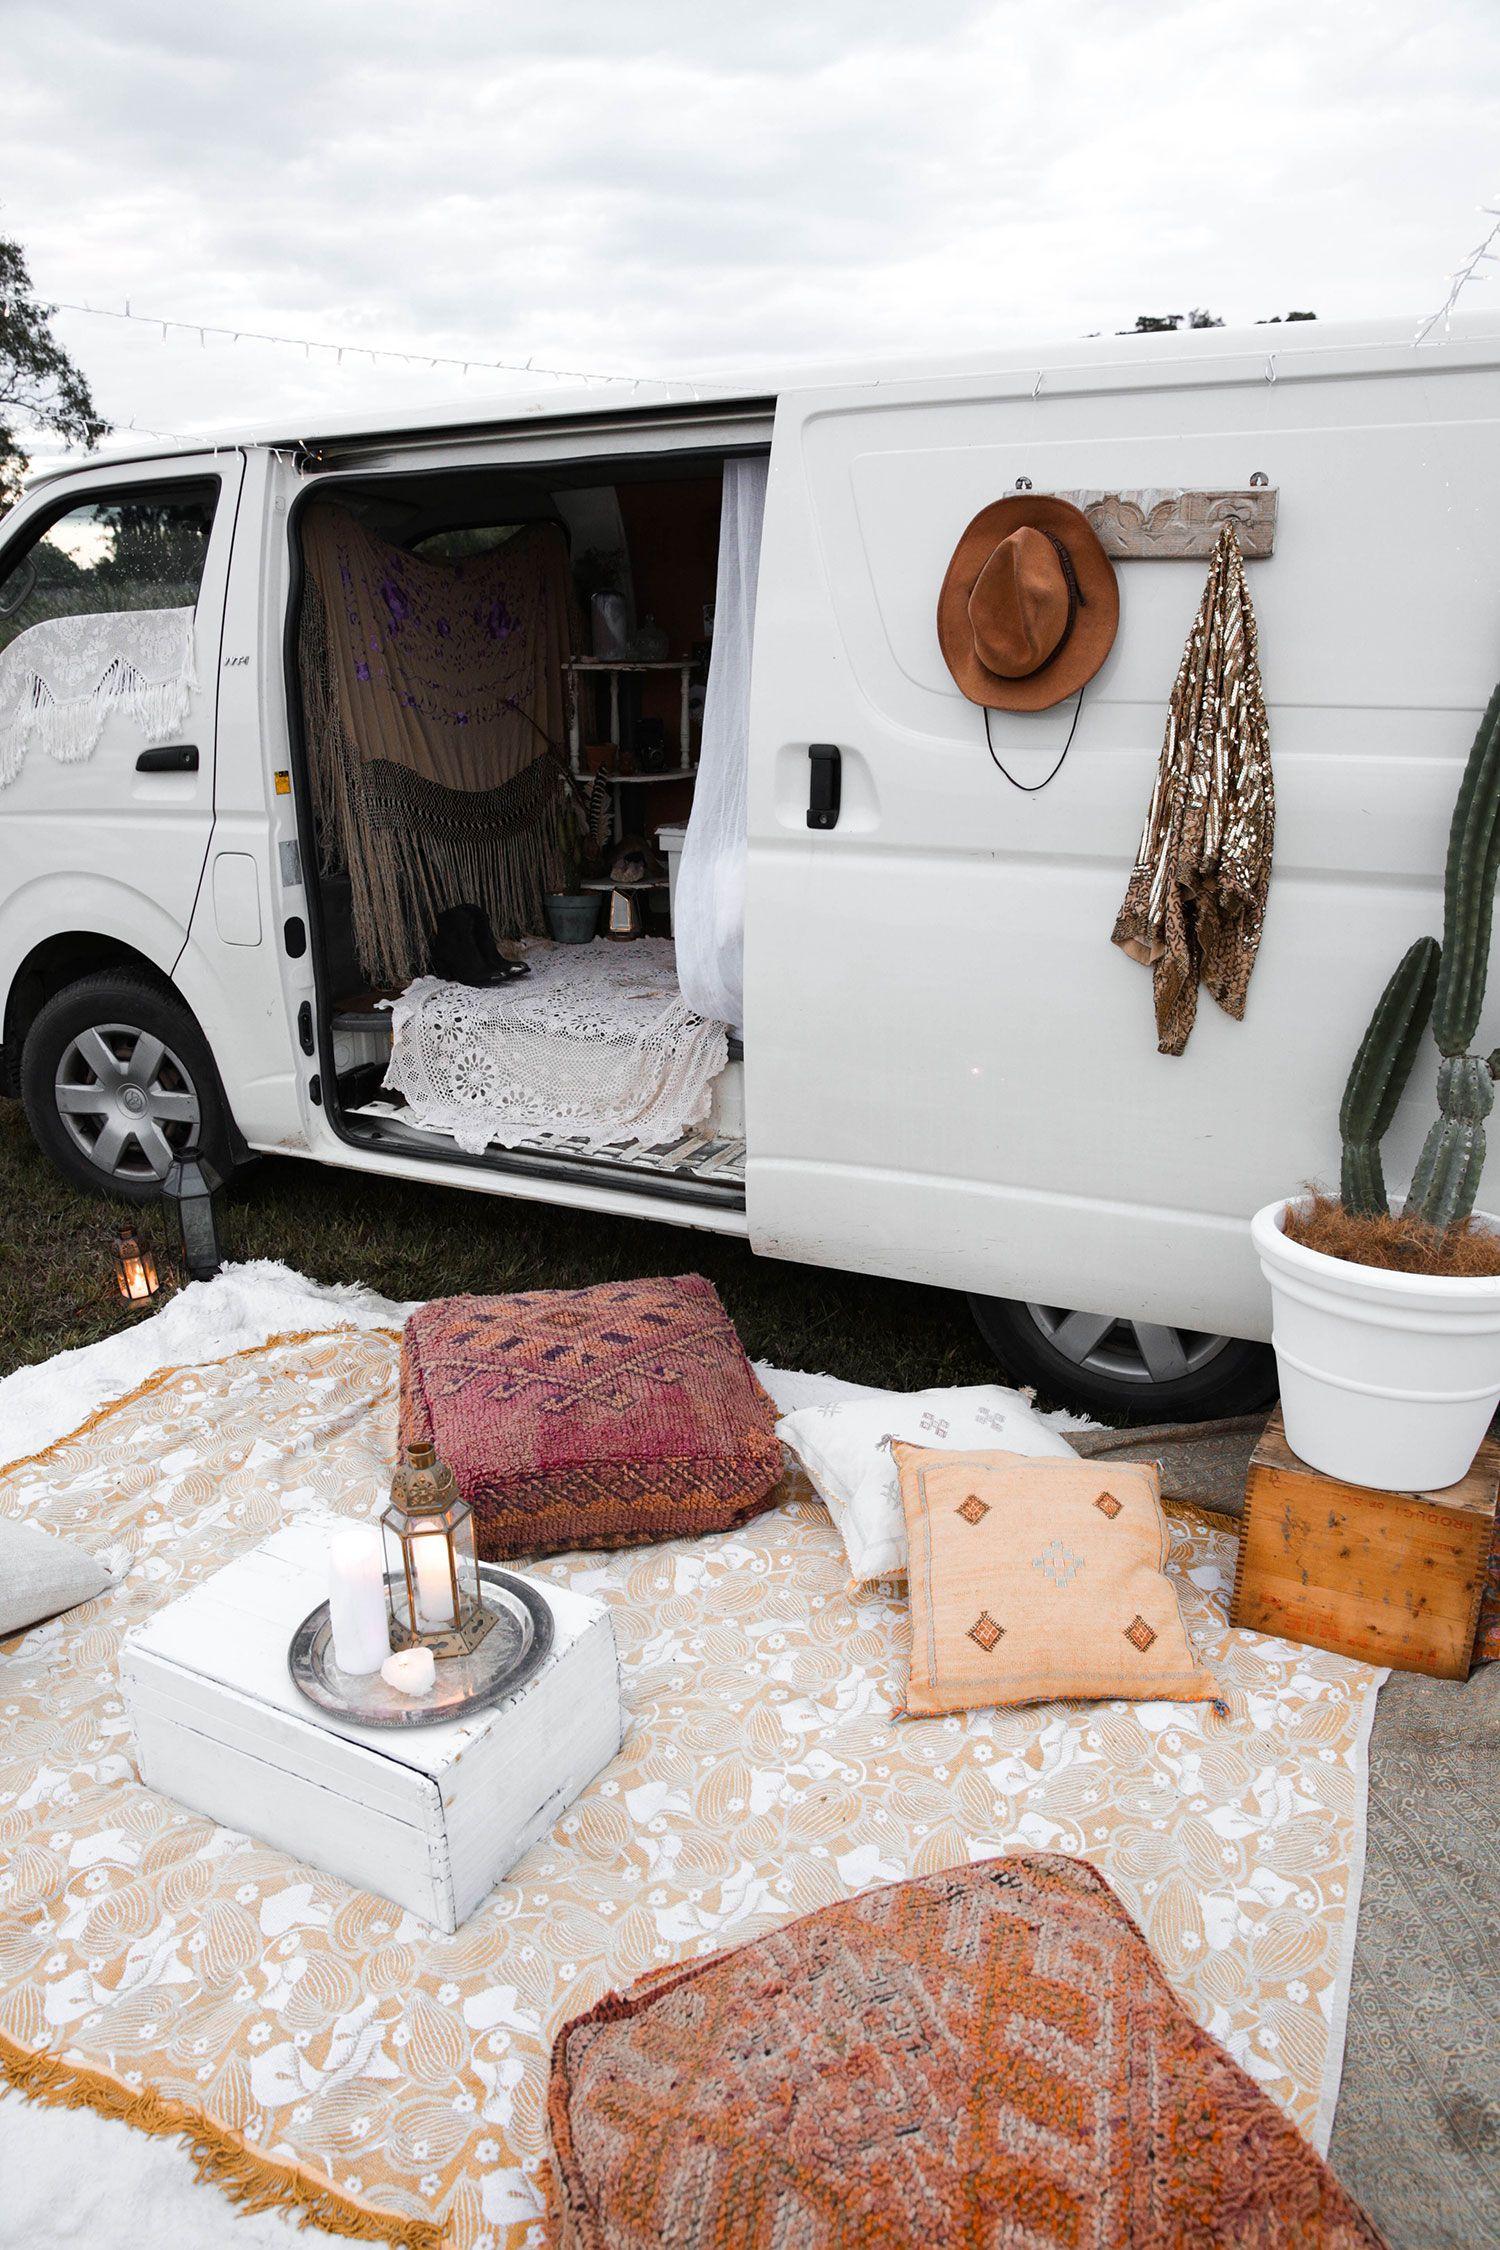 Spell Festival Van Set Up | Bohemien decor | Pinterest | Vans, Small ...